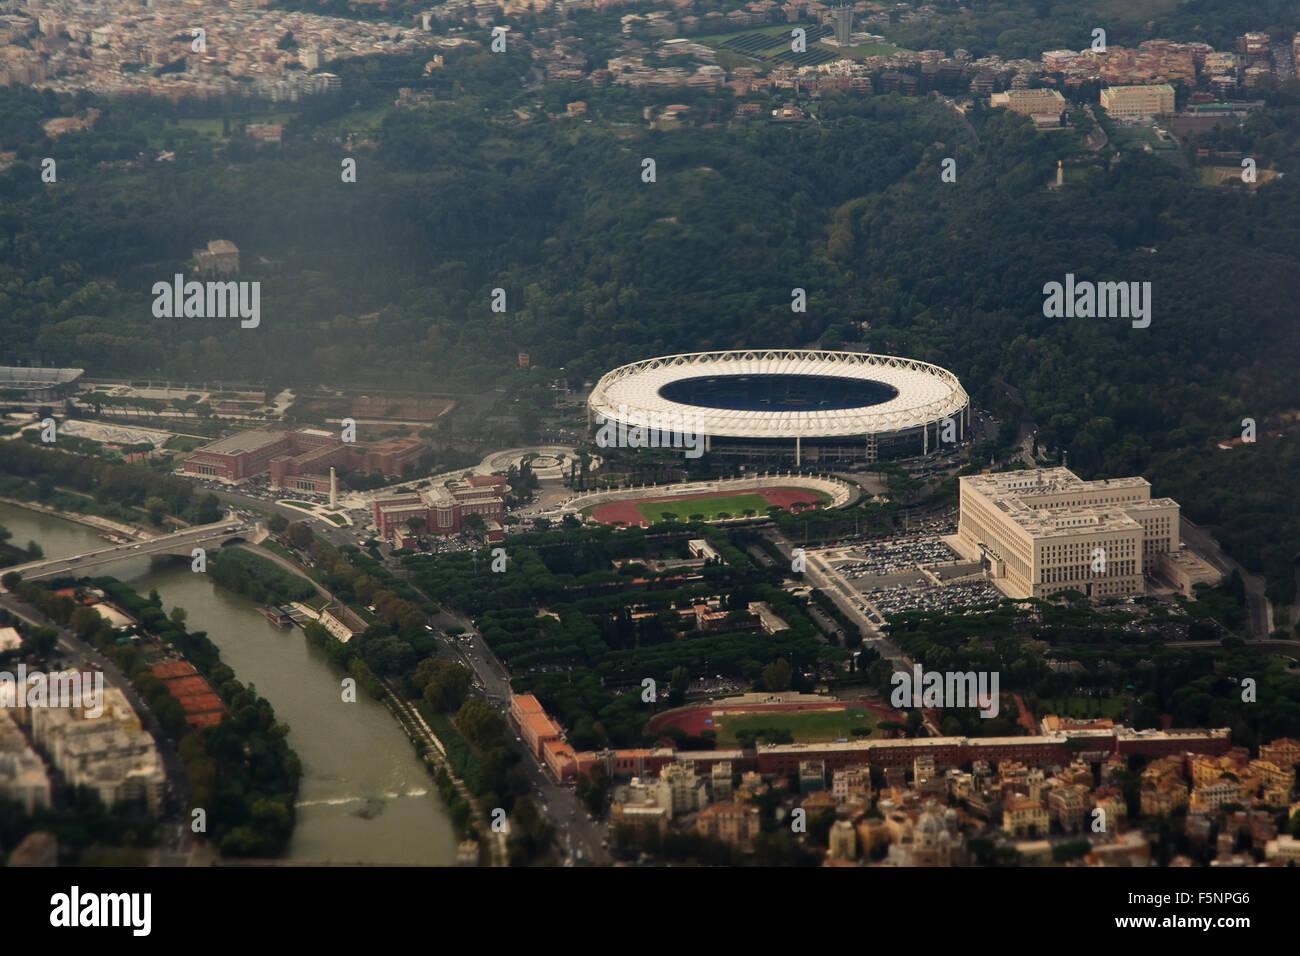 Vista aerea di Roma: Stadio Olimpico Immagini Stock